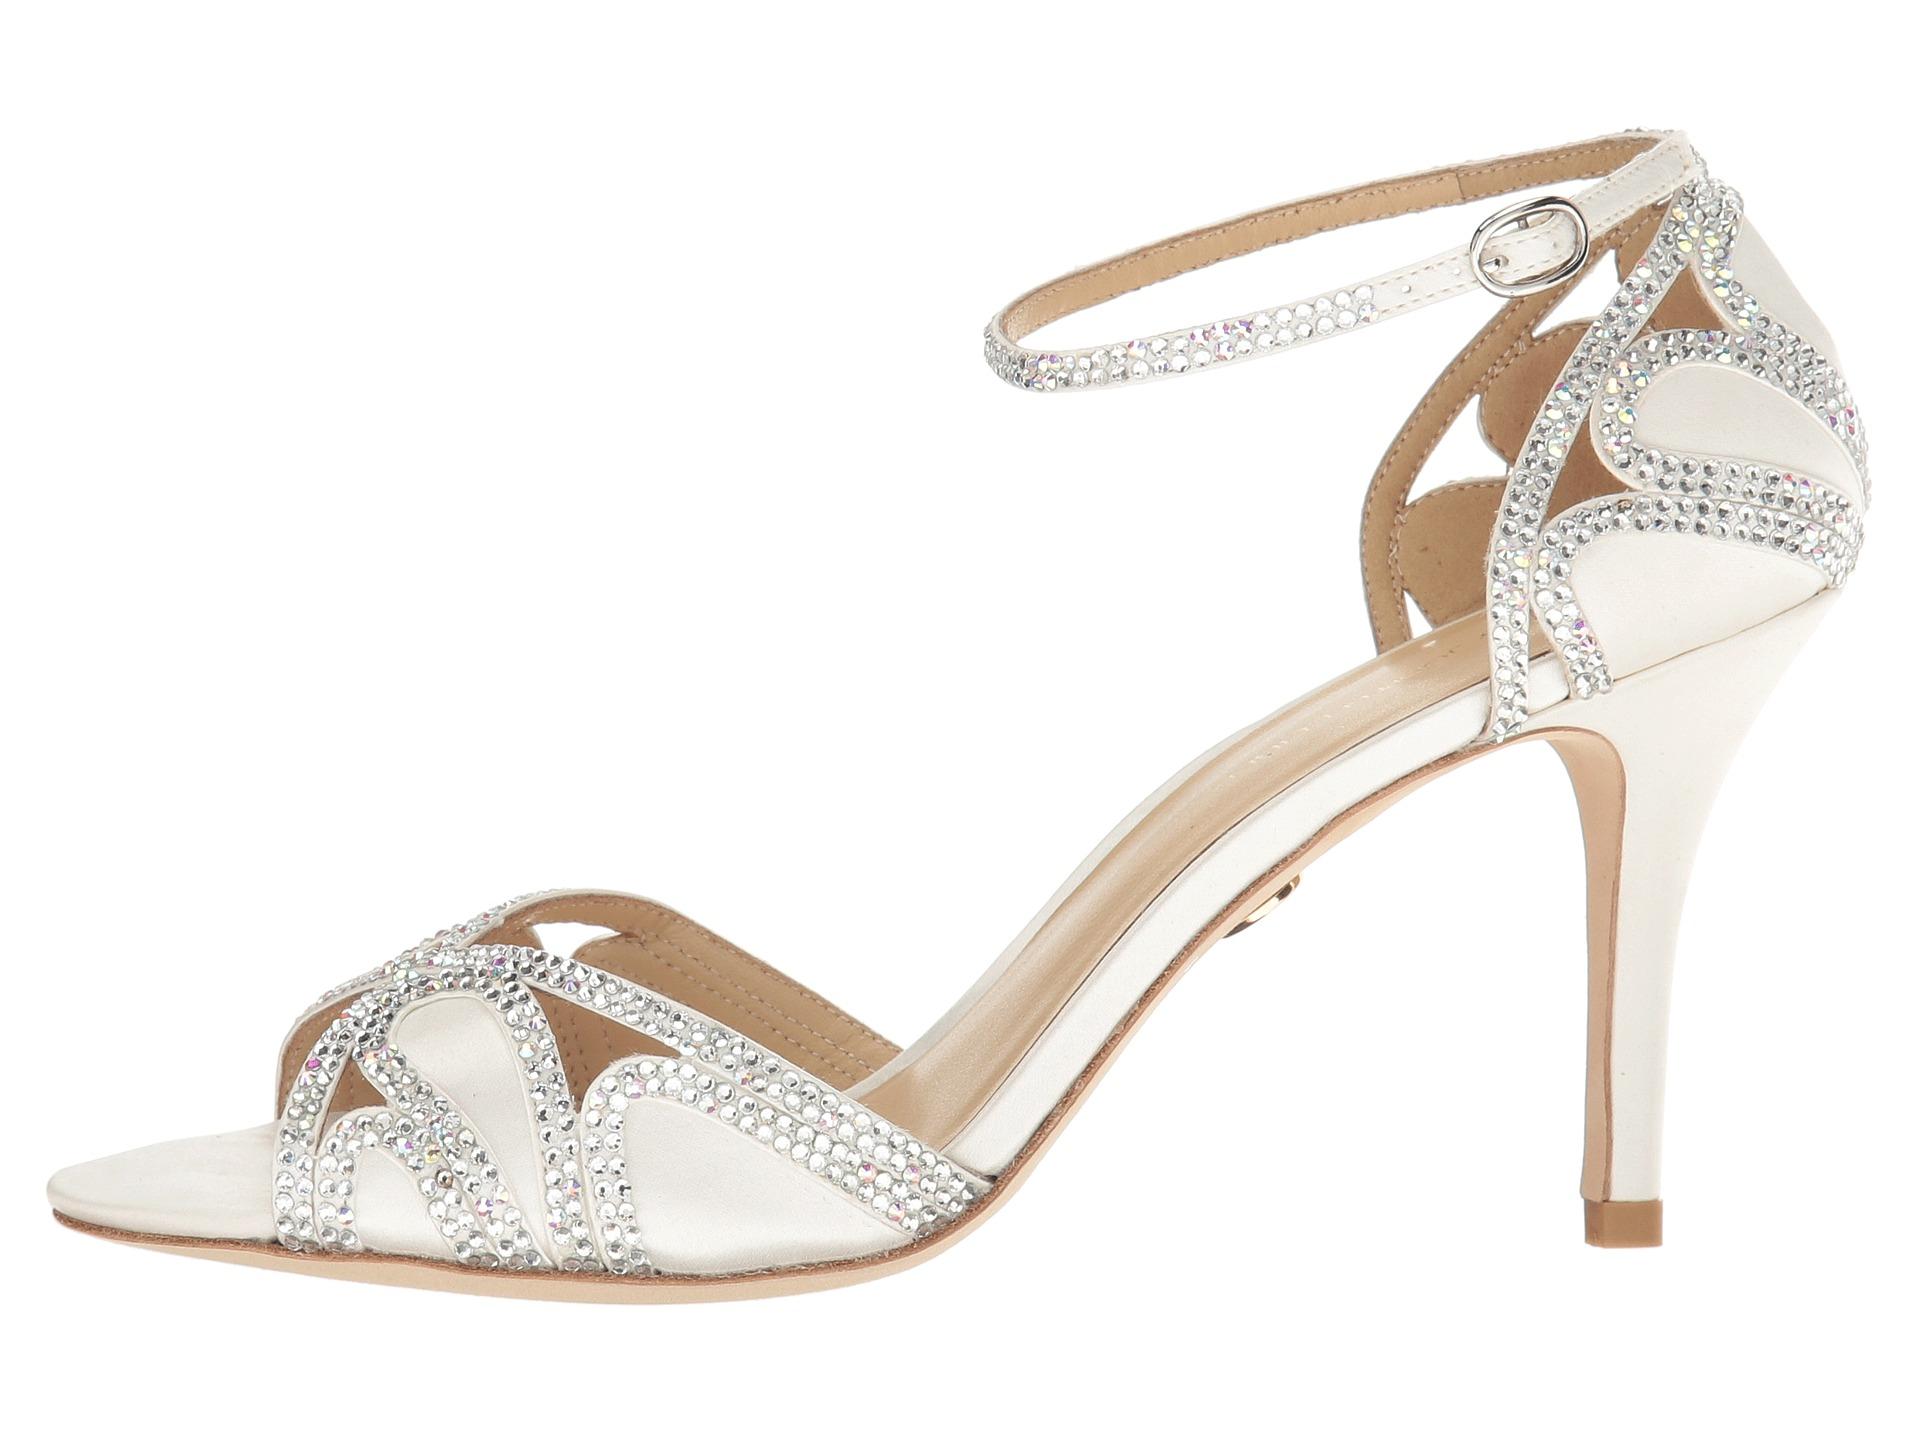 Judith Leiber Wedding Shoes